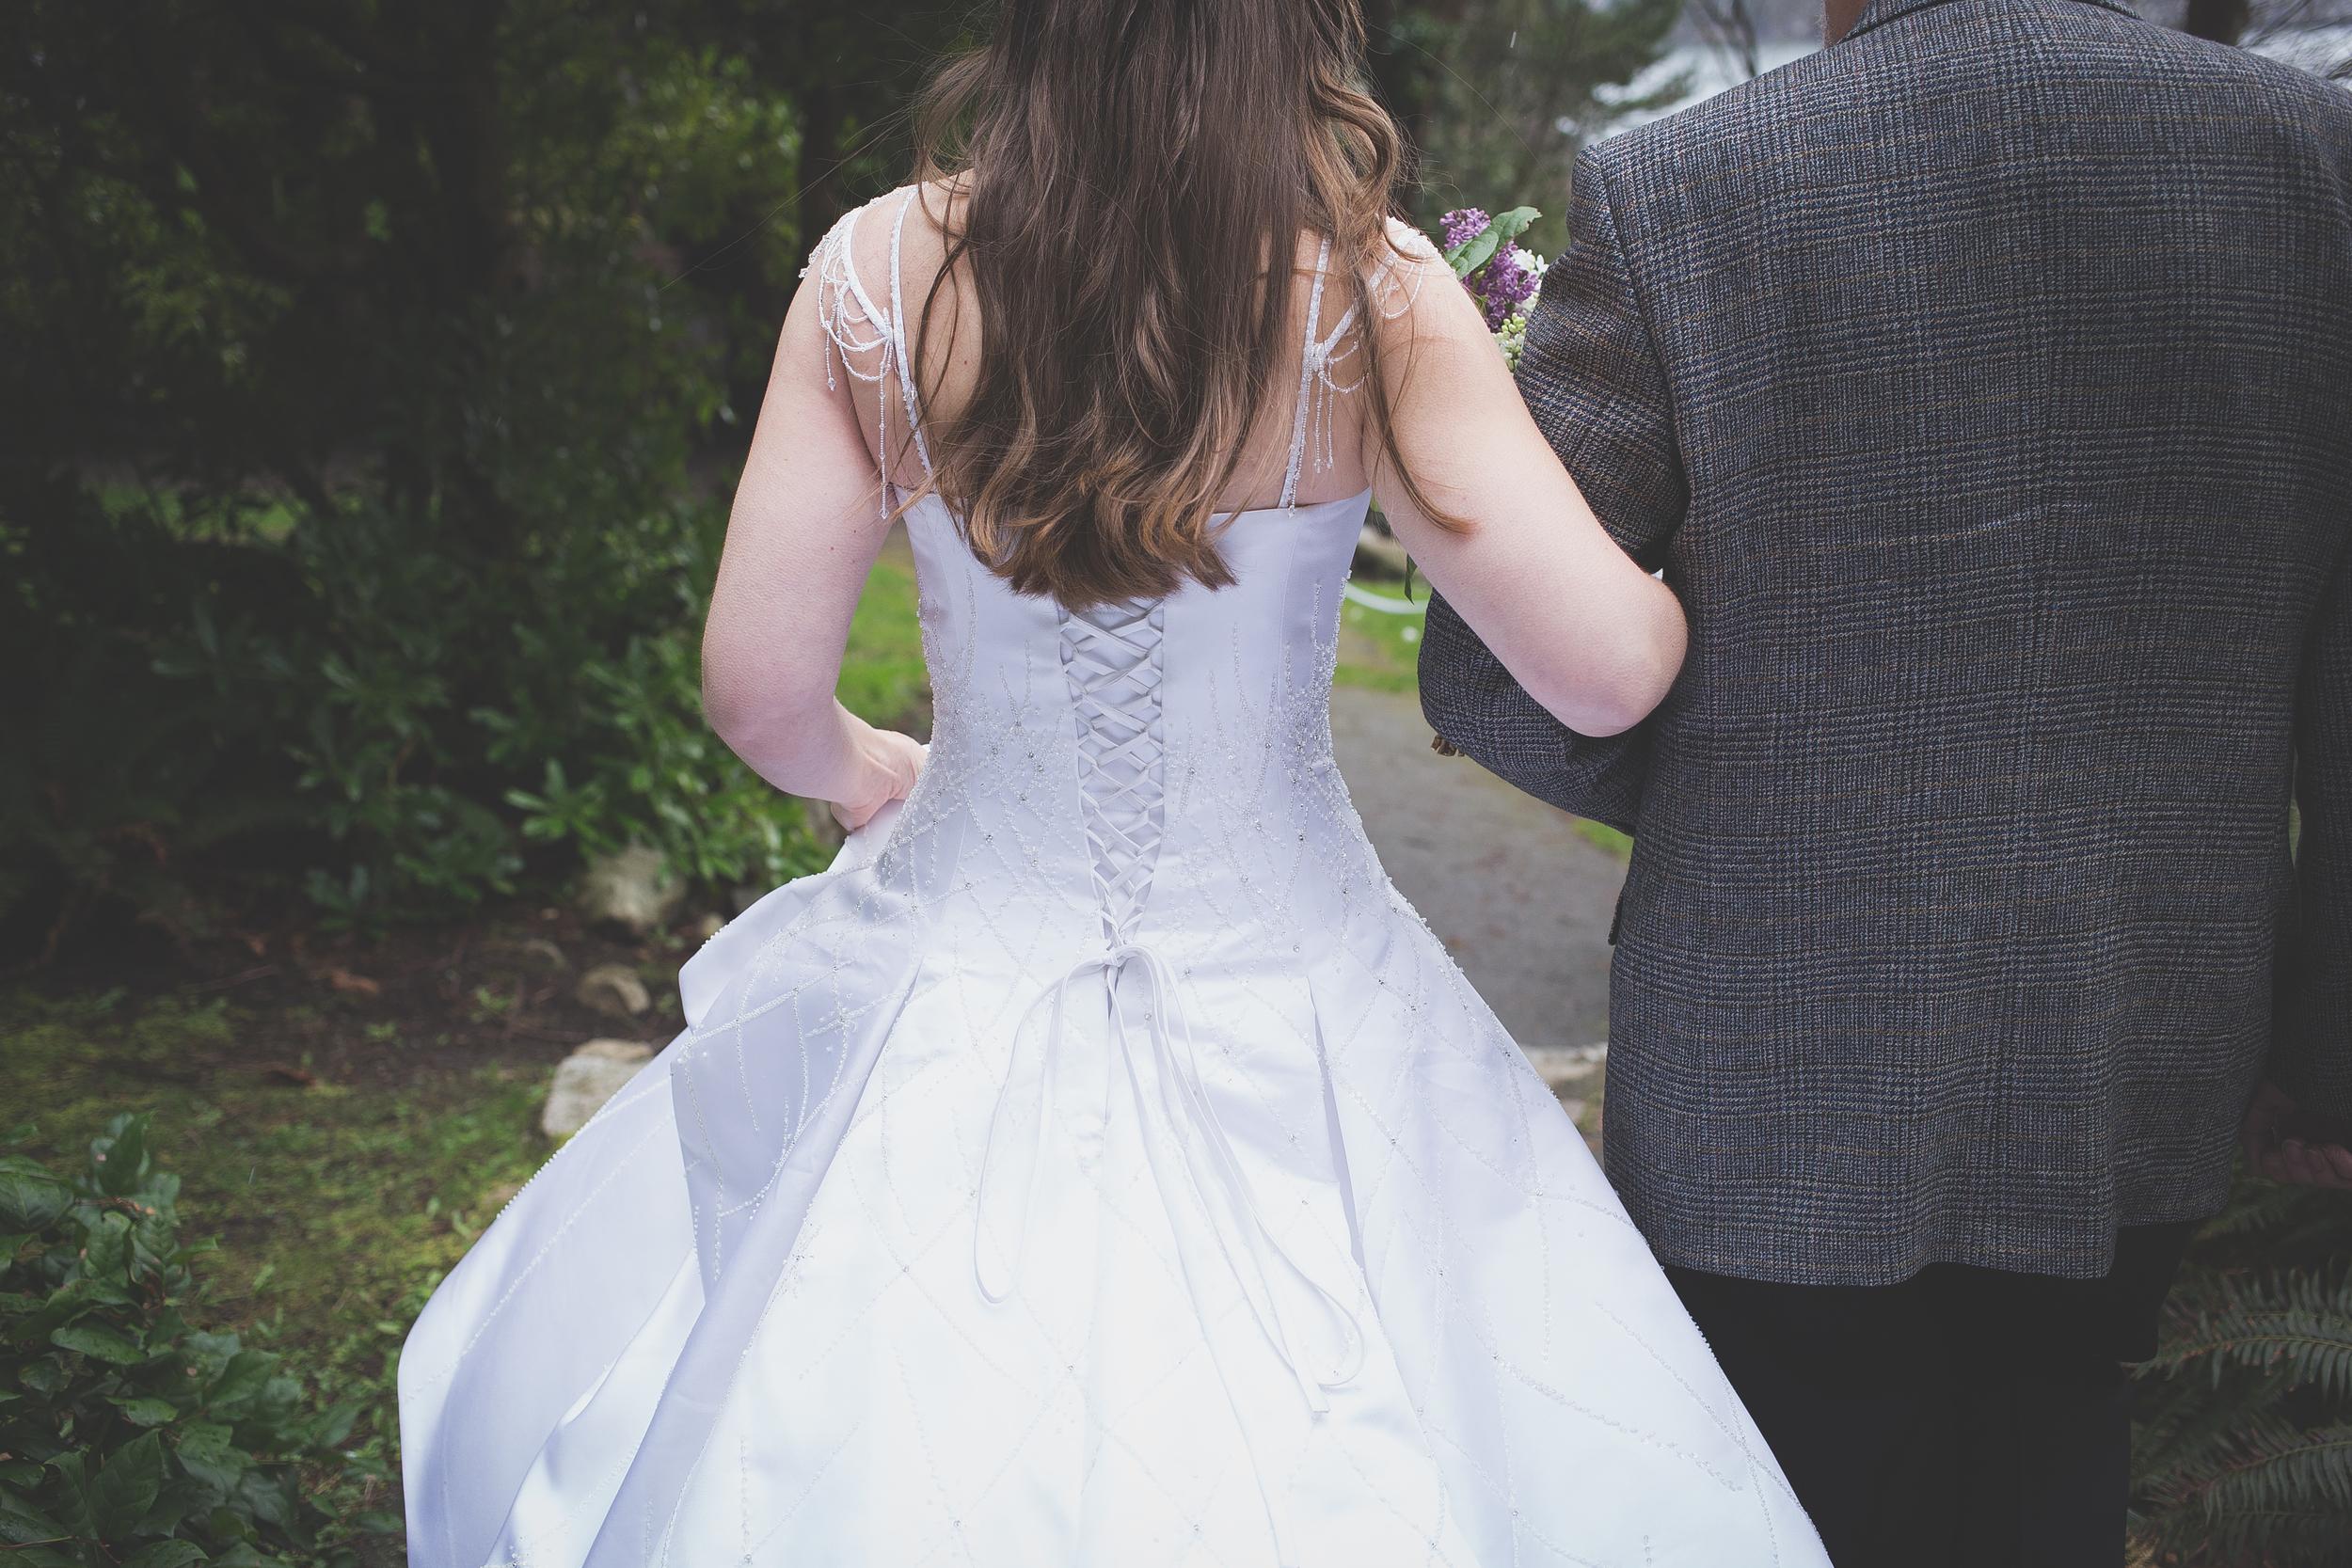 vancouver_photographer_wedding_DogwoodPhotography-64.jpg